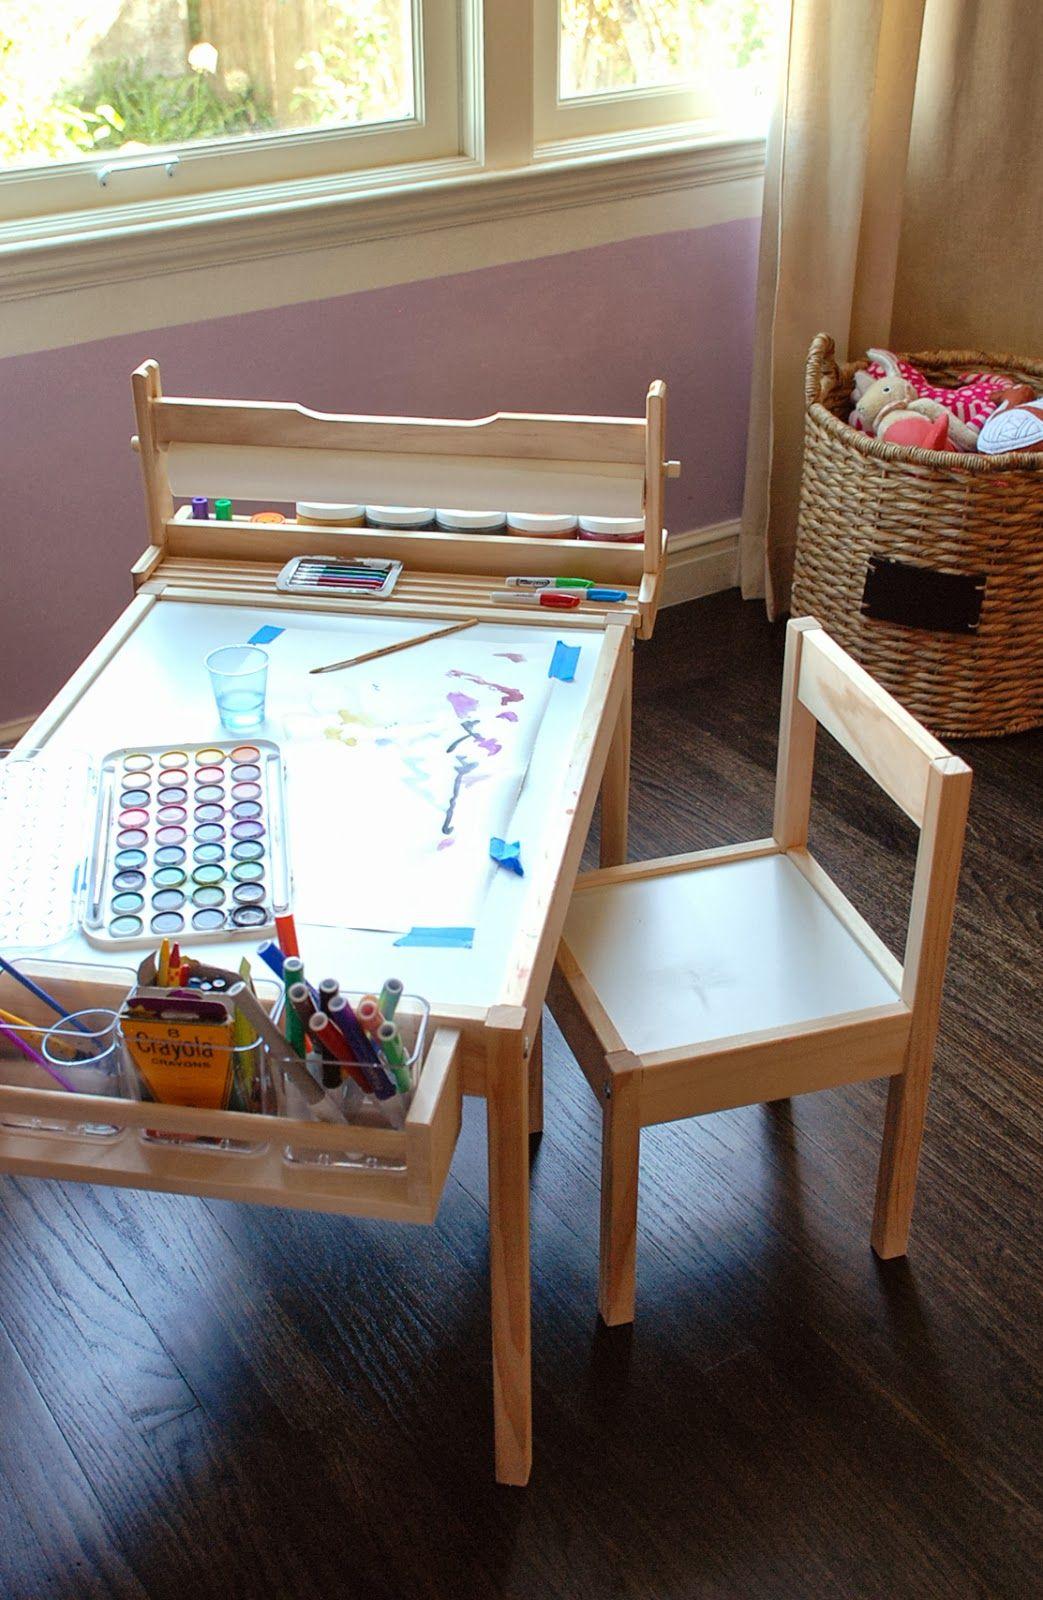 Design ingenuity diy kids craft table playroom for Raumgestaltung ikea